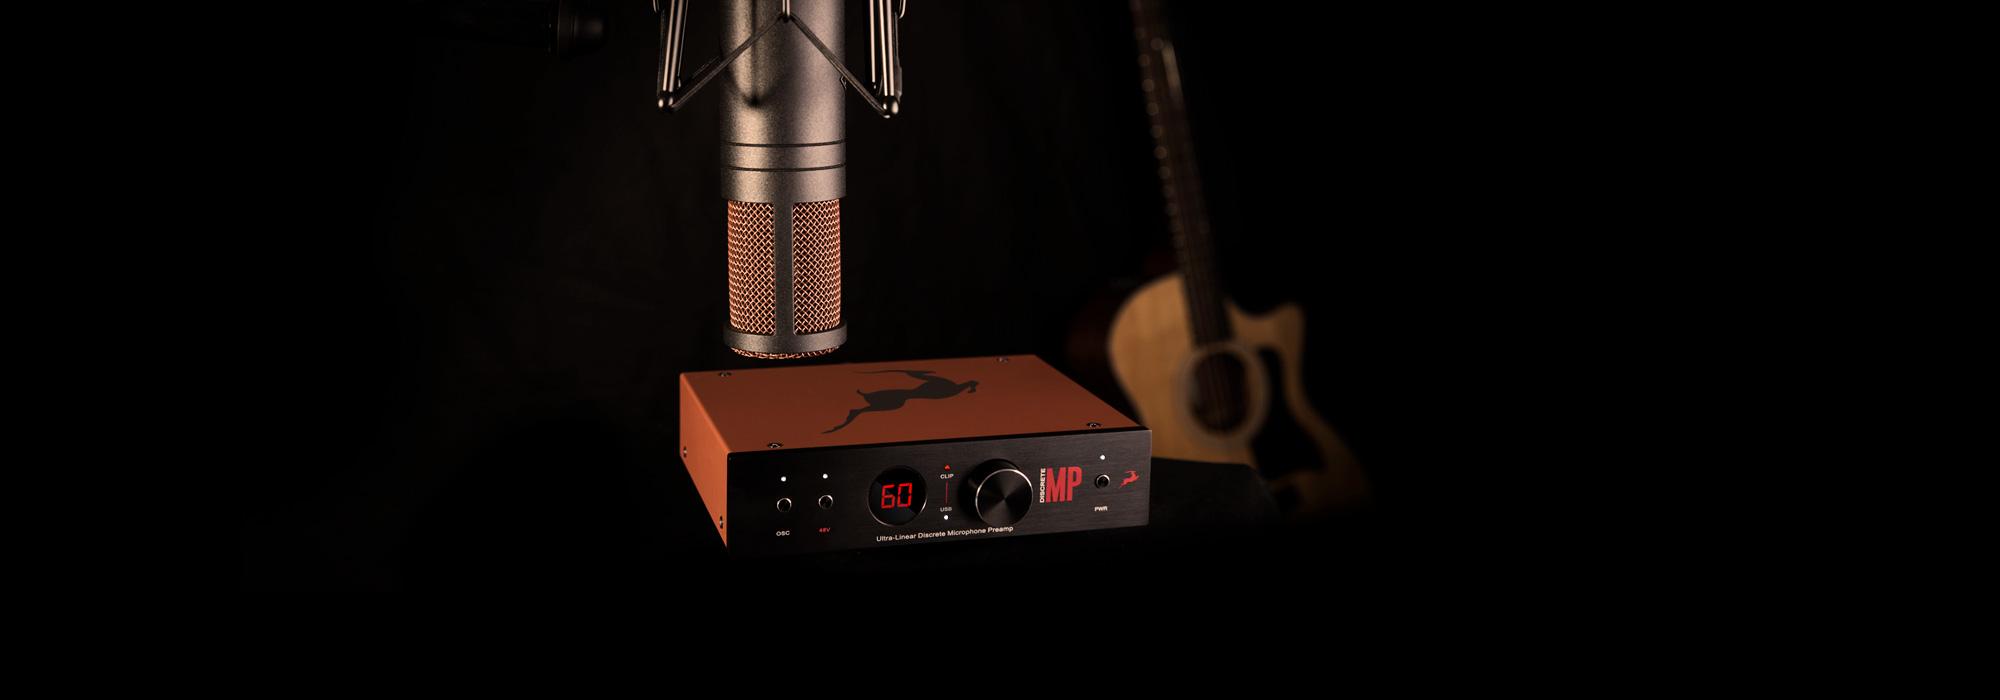 Antelope Audio announced EDGE Strip breakthrough bundle debut during the 2018 NAMM Show